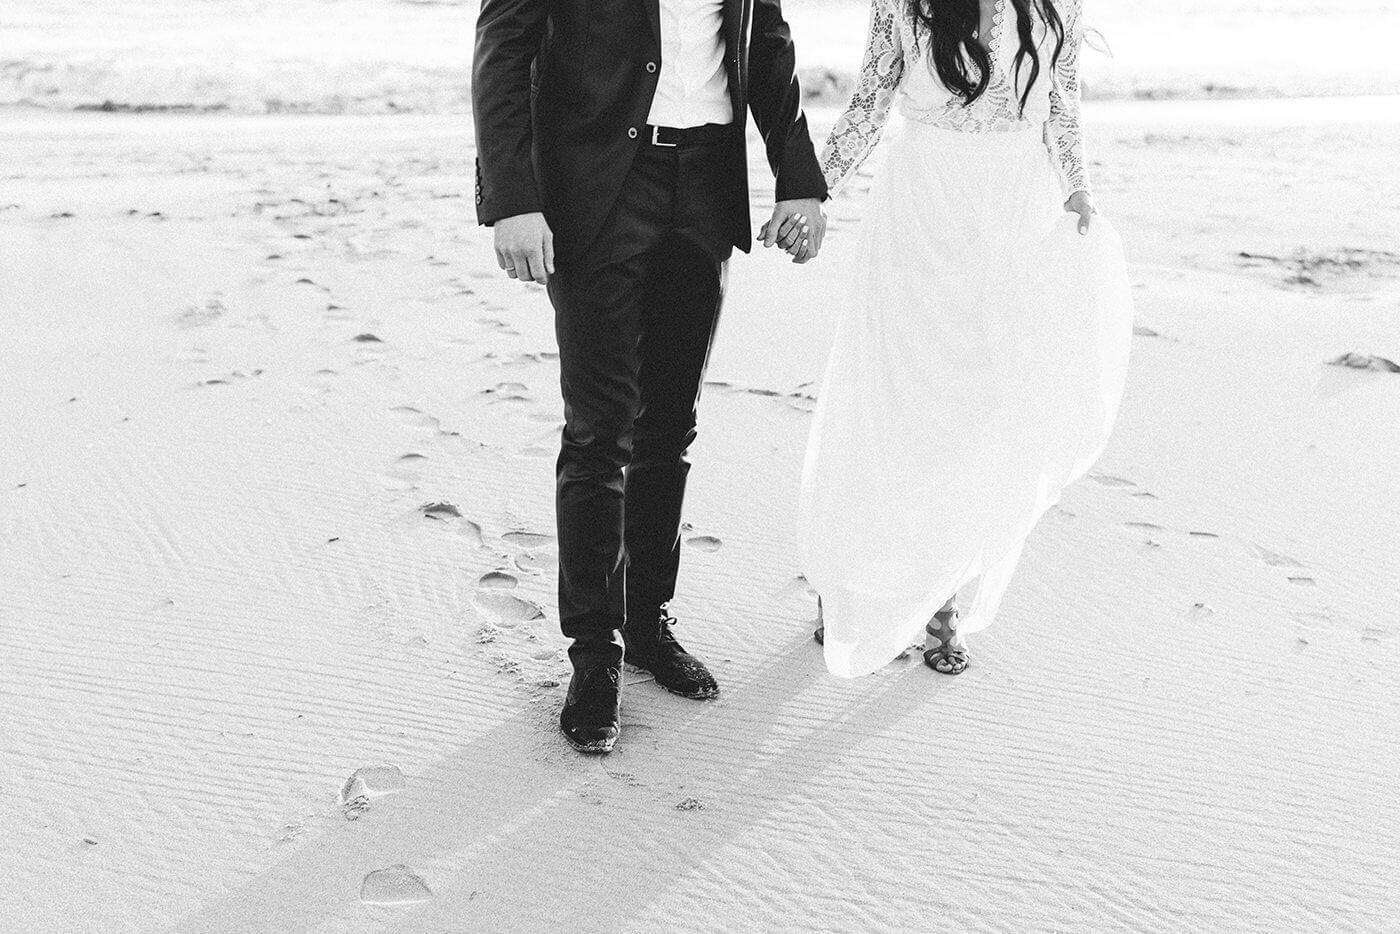 Destination_wedding_Bruiloft_Italie_Italy_Styledwedding_Bruidsfotograaf_Nijmegen_17